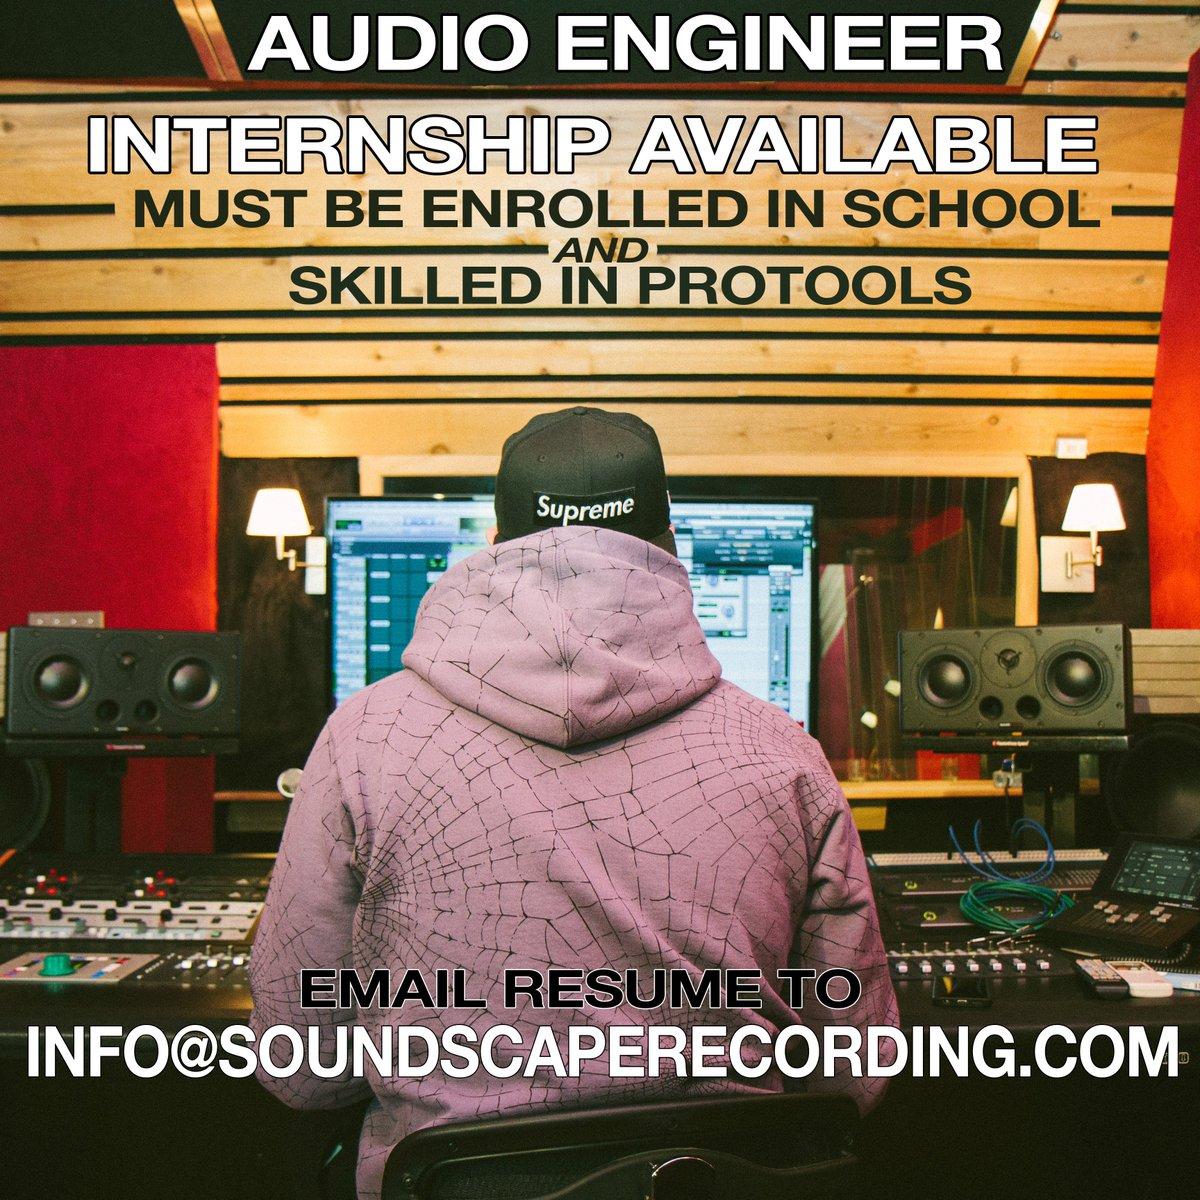 SoundScape Studios on Twitter: